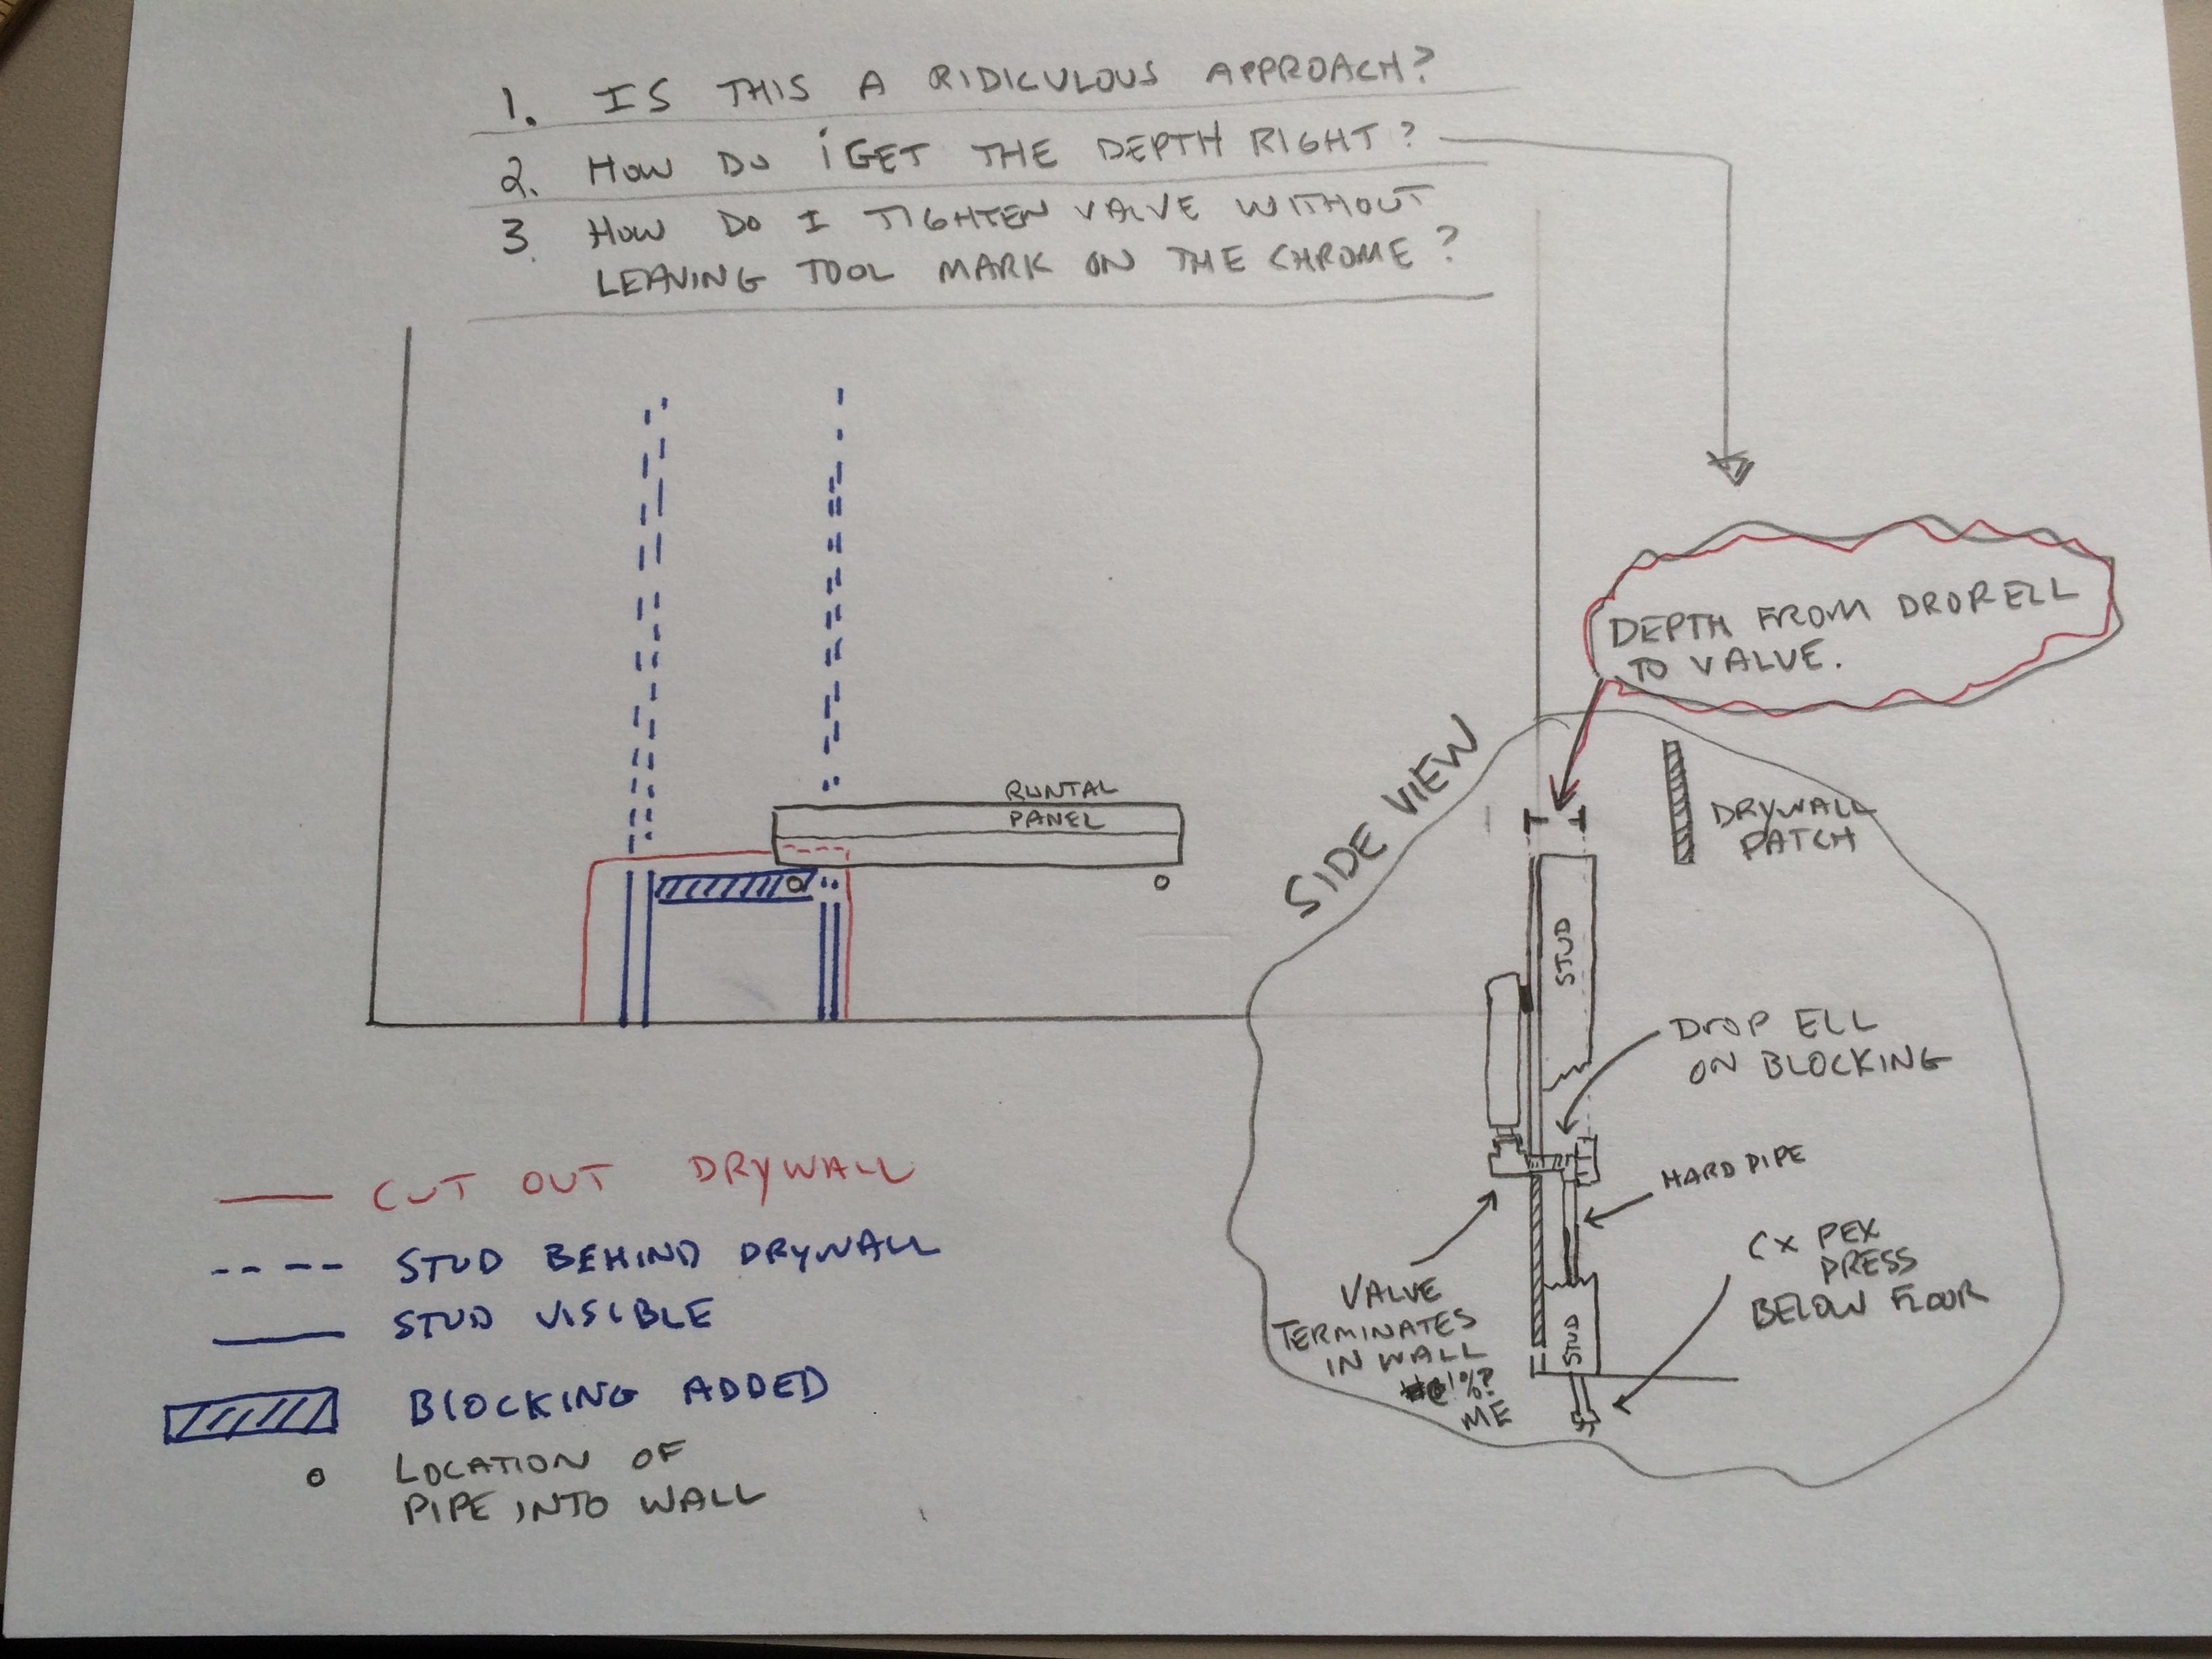 img4258 - Runtal Radiators